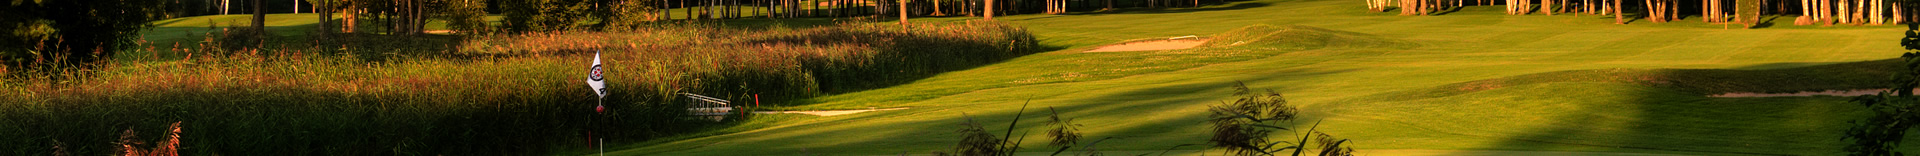 golfikeskus_vaike3